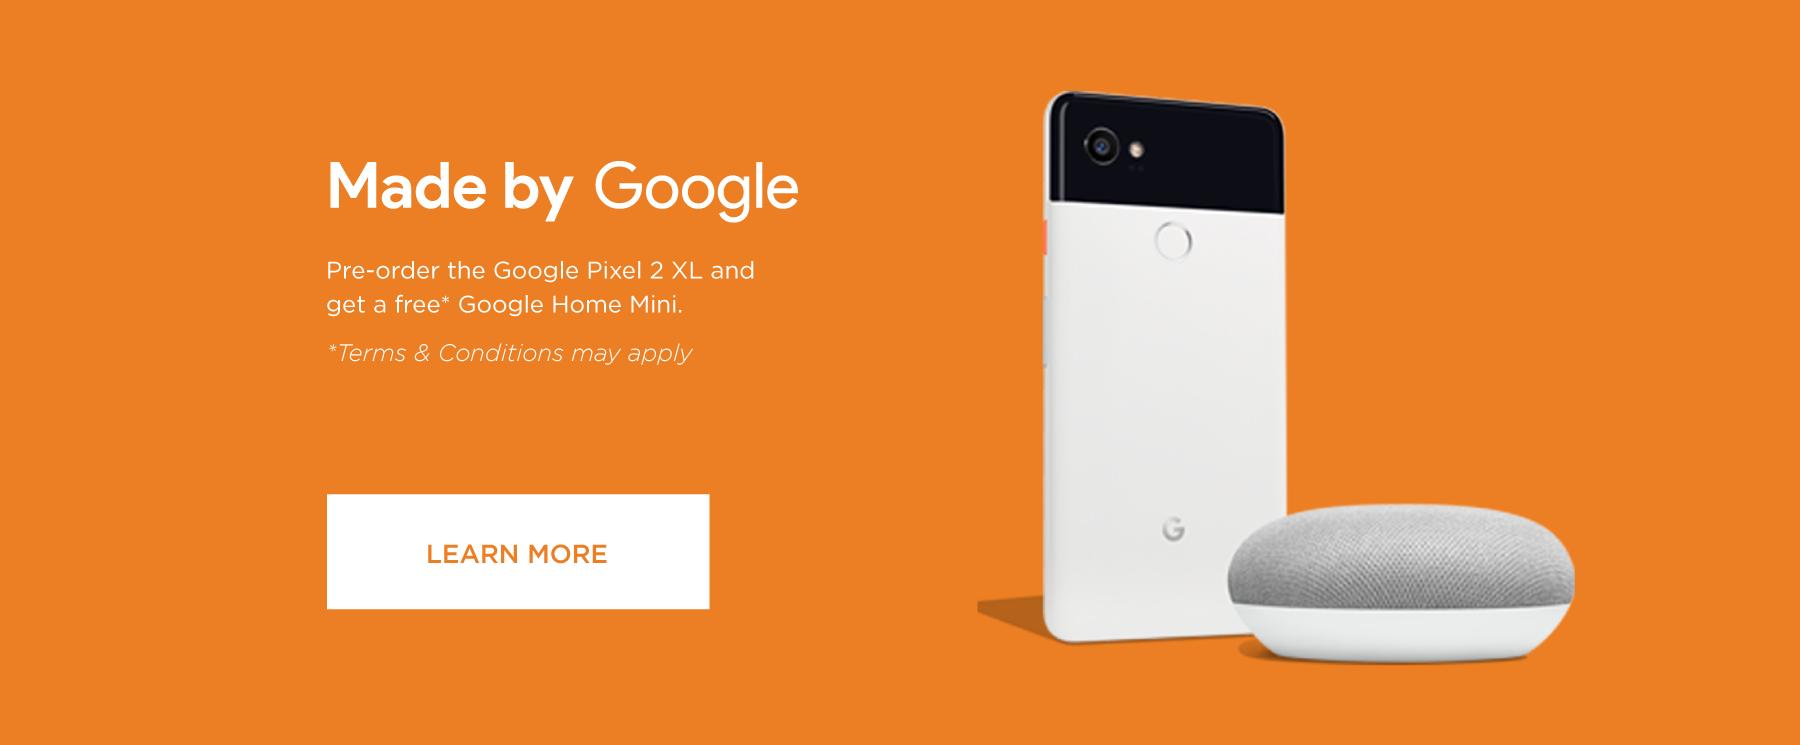 Pixel 2 with free Google Home Mini